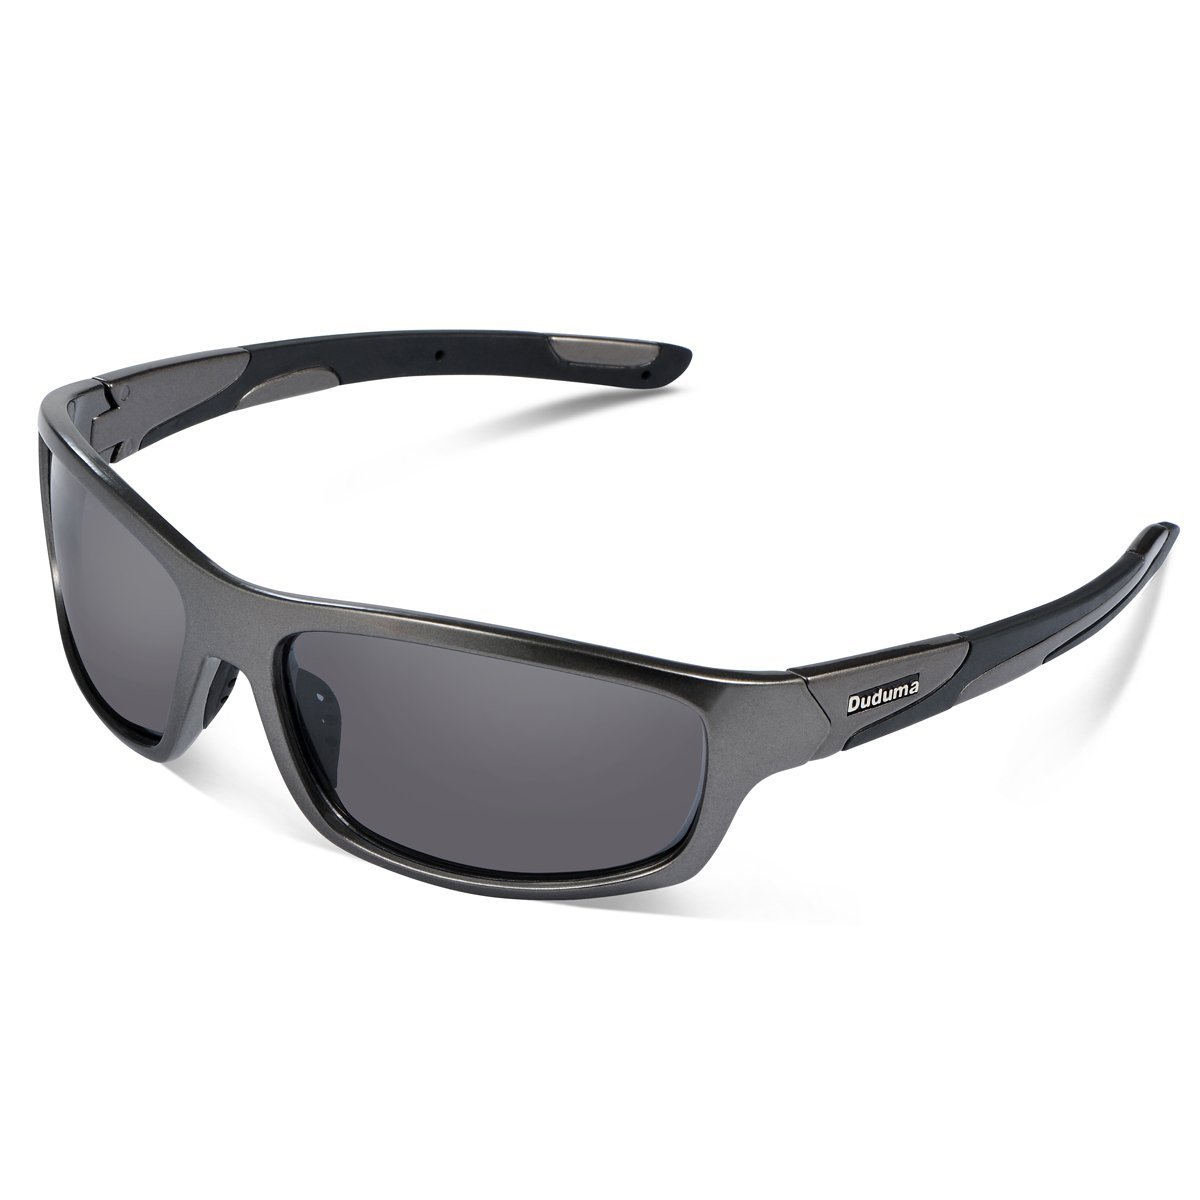 941e7d5fd5d Duduma Polarized Sports Sunglasses for Men Women Baseball Running Cycling  Fishing Driving Golf Softball Hiking Sunglasses